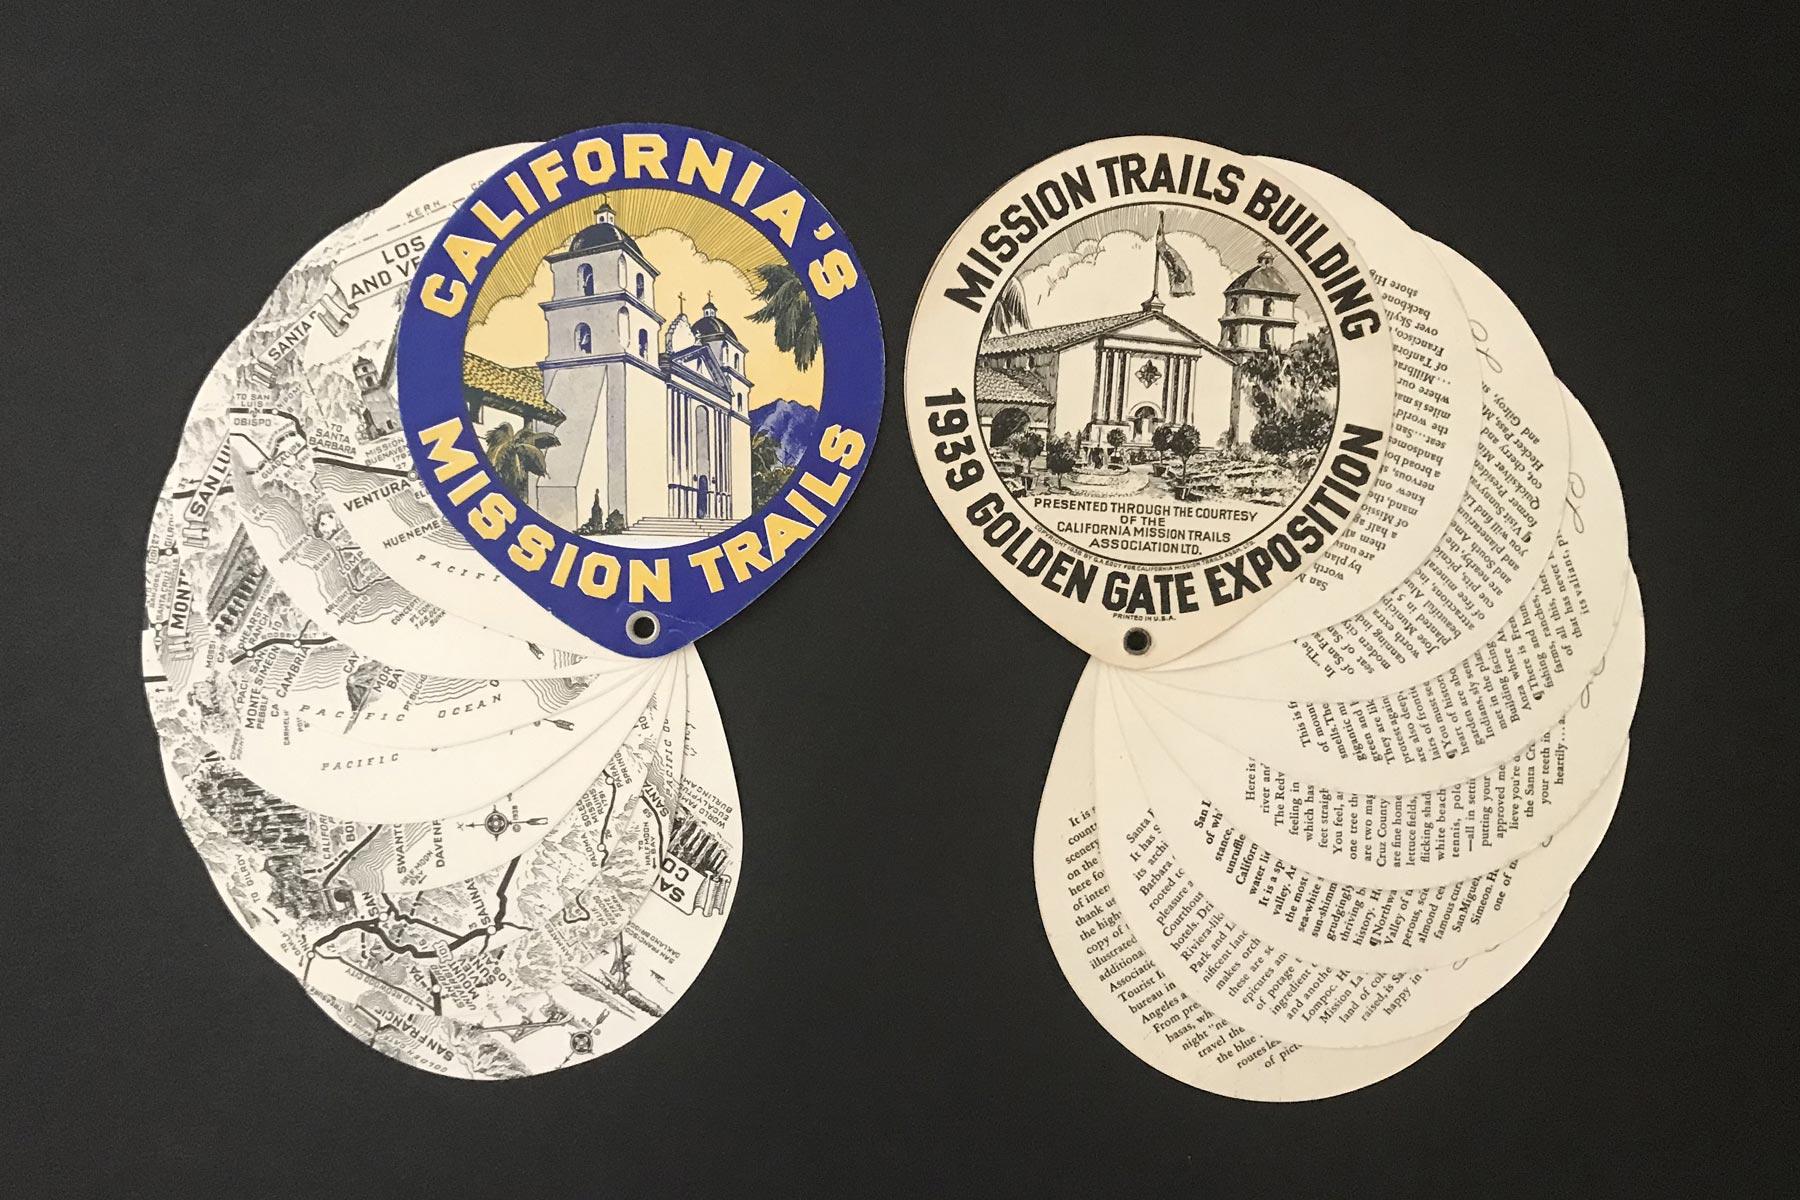 california mission trails maps